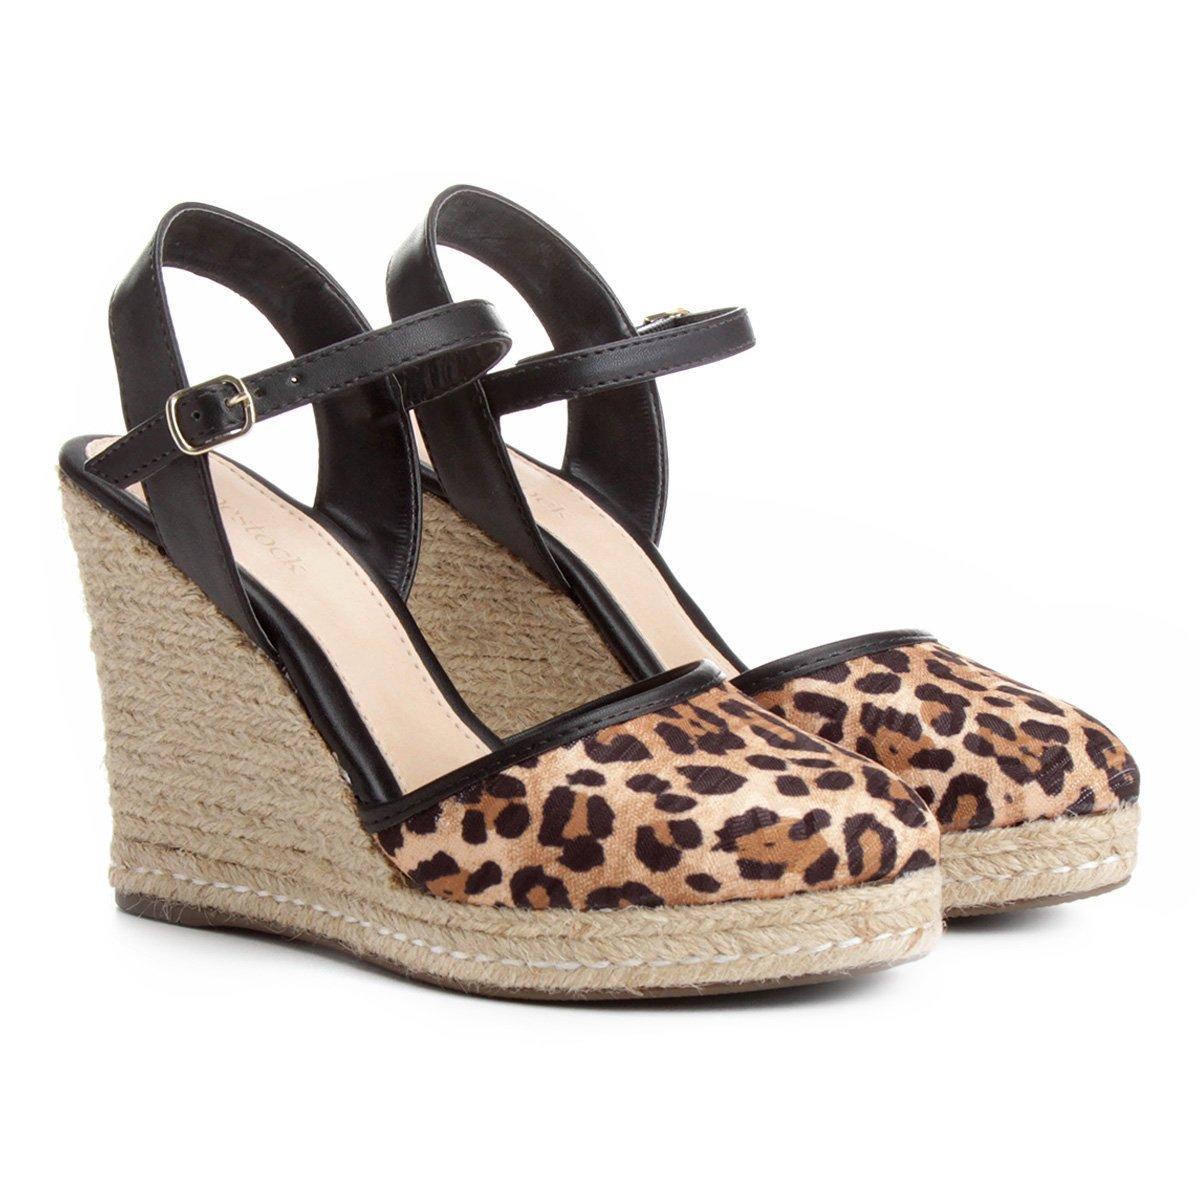 2a7b66c2c Sandália Plataforma Shoestock Fechada Feminina   Shoestock